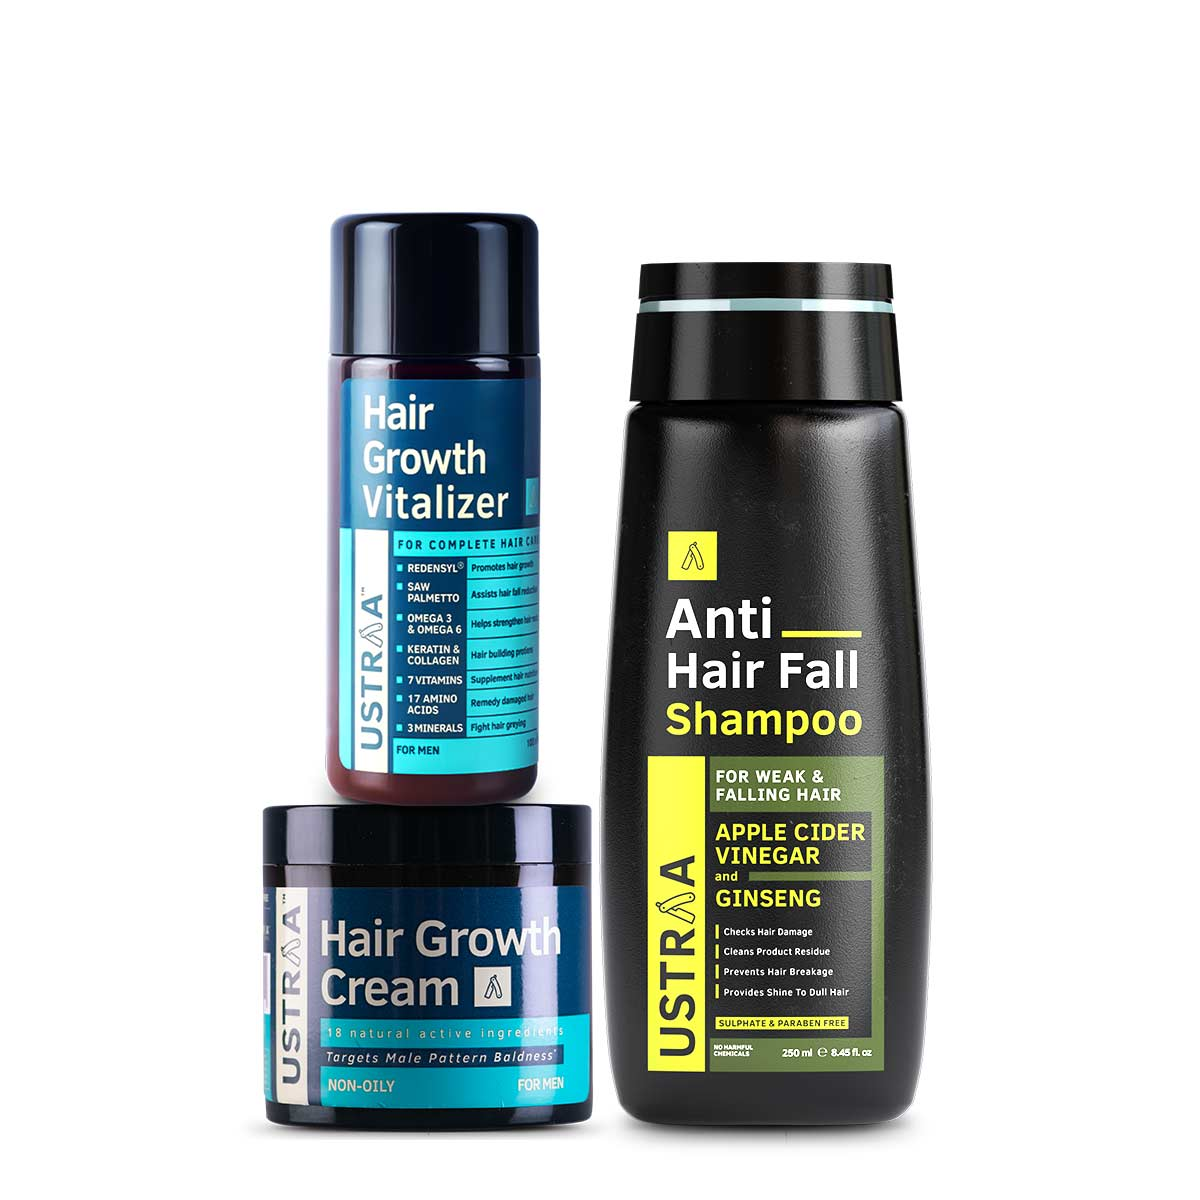 Ustraa | Anti Hair Fall Shampoo, Hair Growth Vitalizer & Cream (Pack of 3)